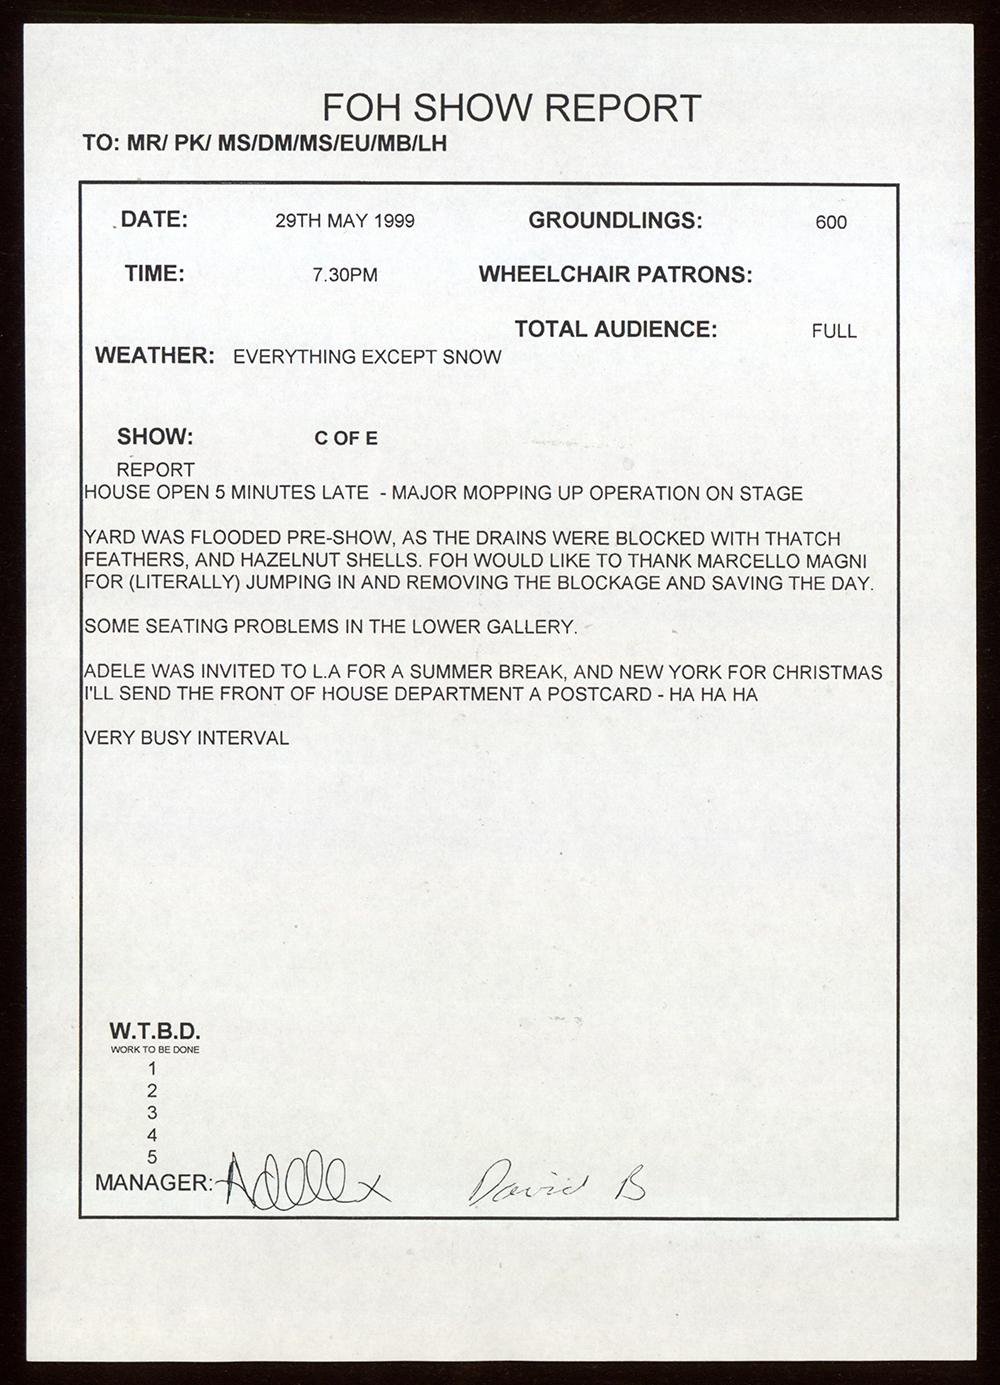 A document detailing a show report